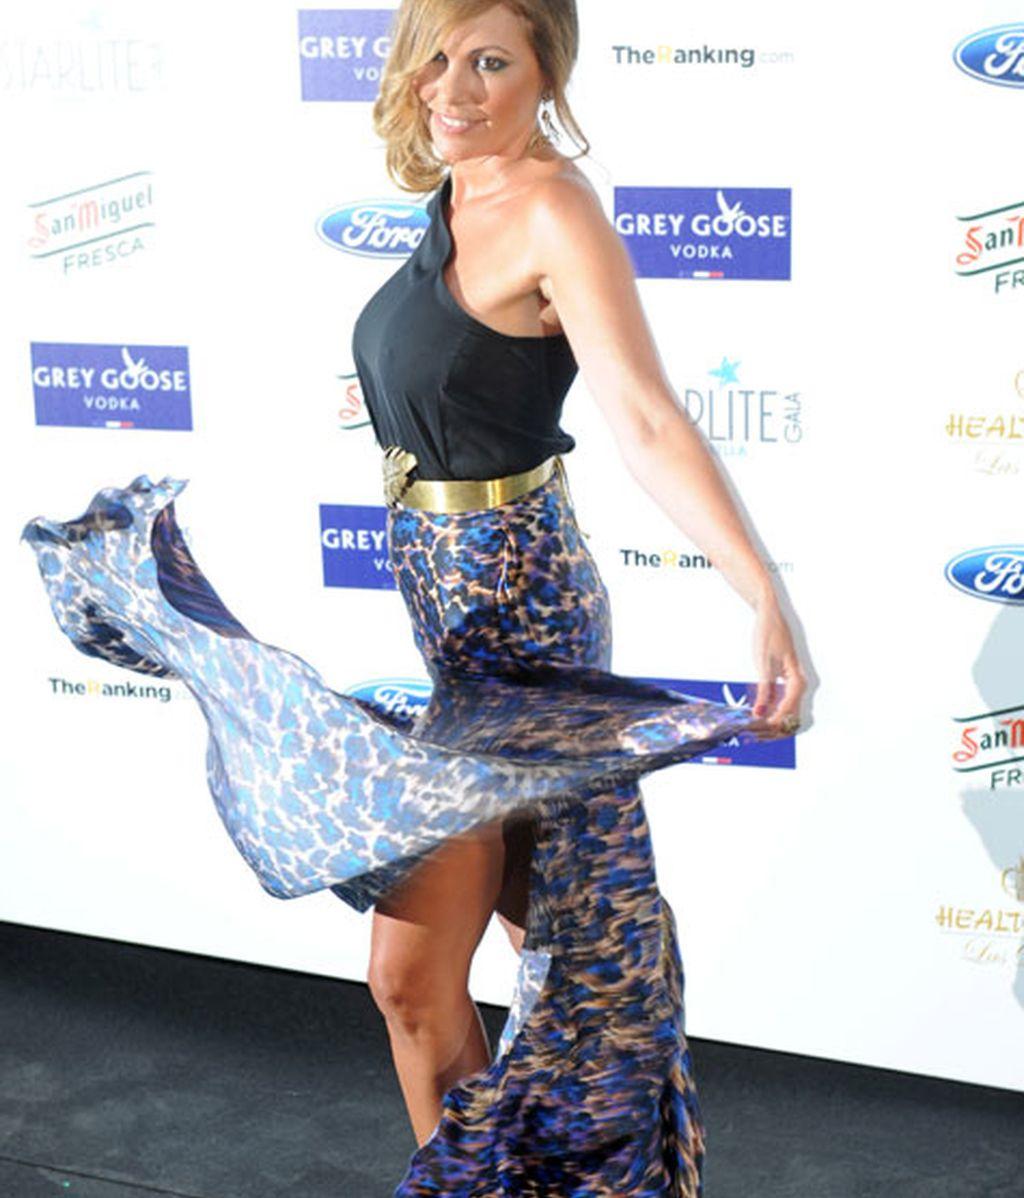 La modelo Raquel Rodríguez lució un vaporoso vestido